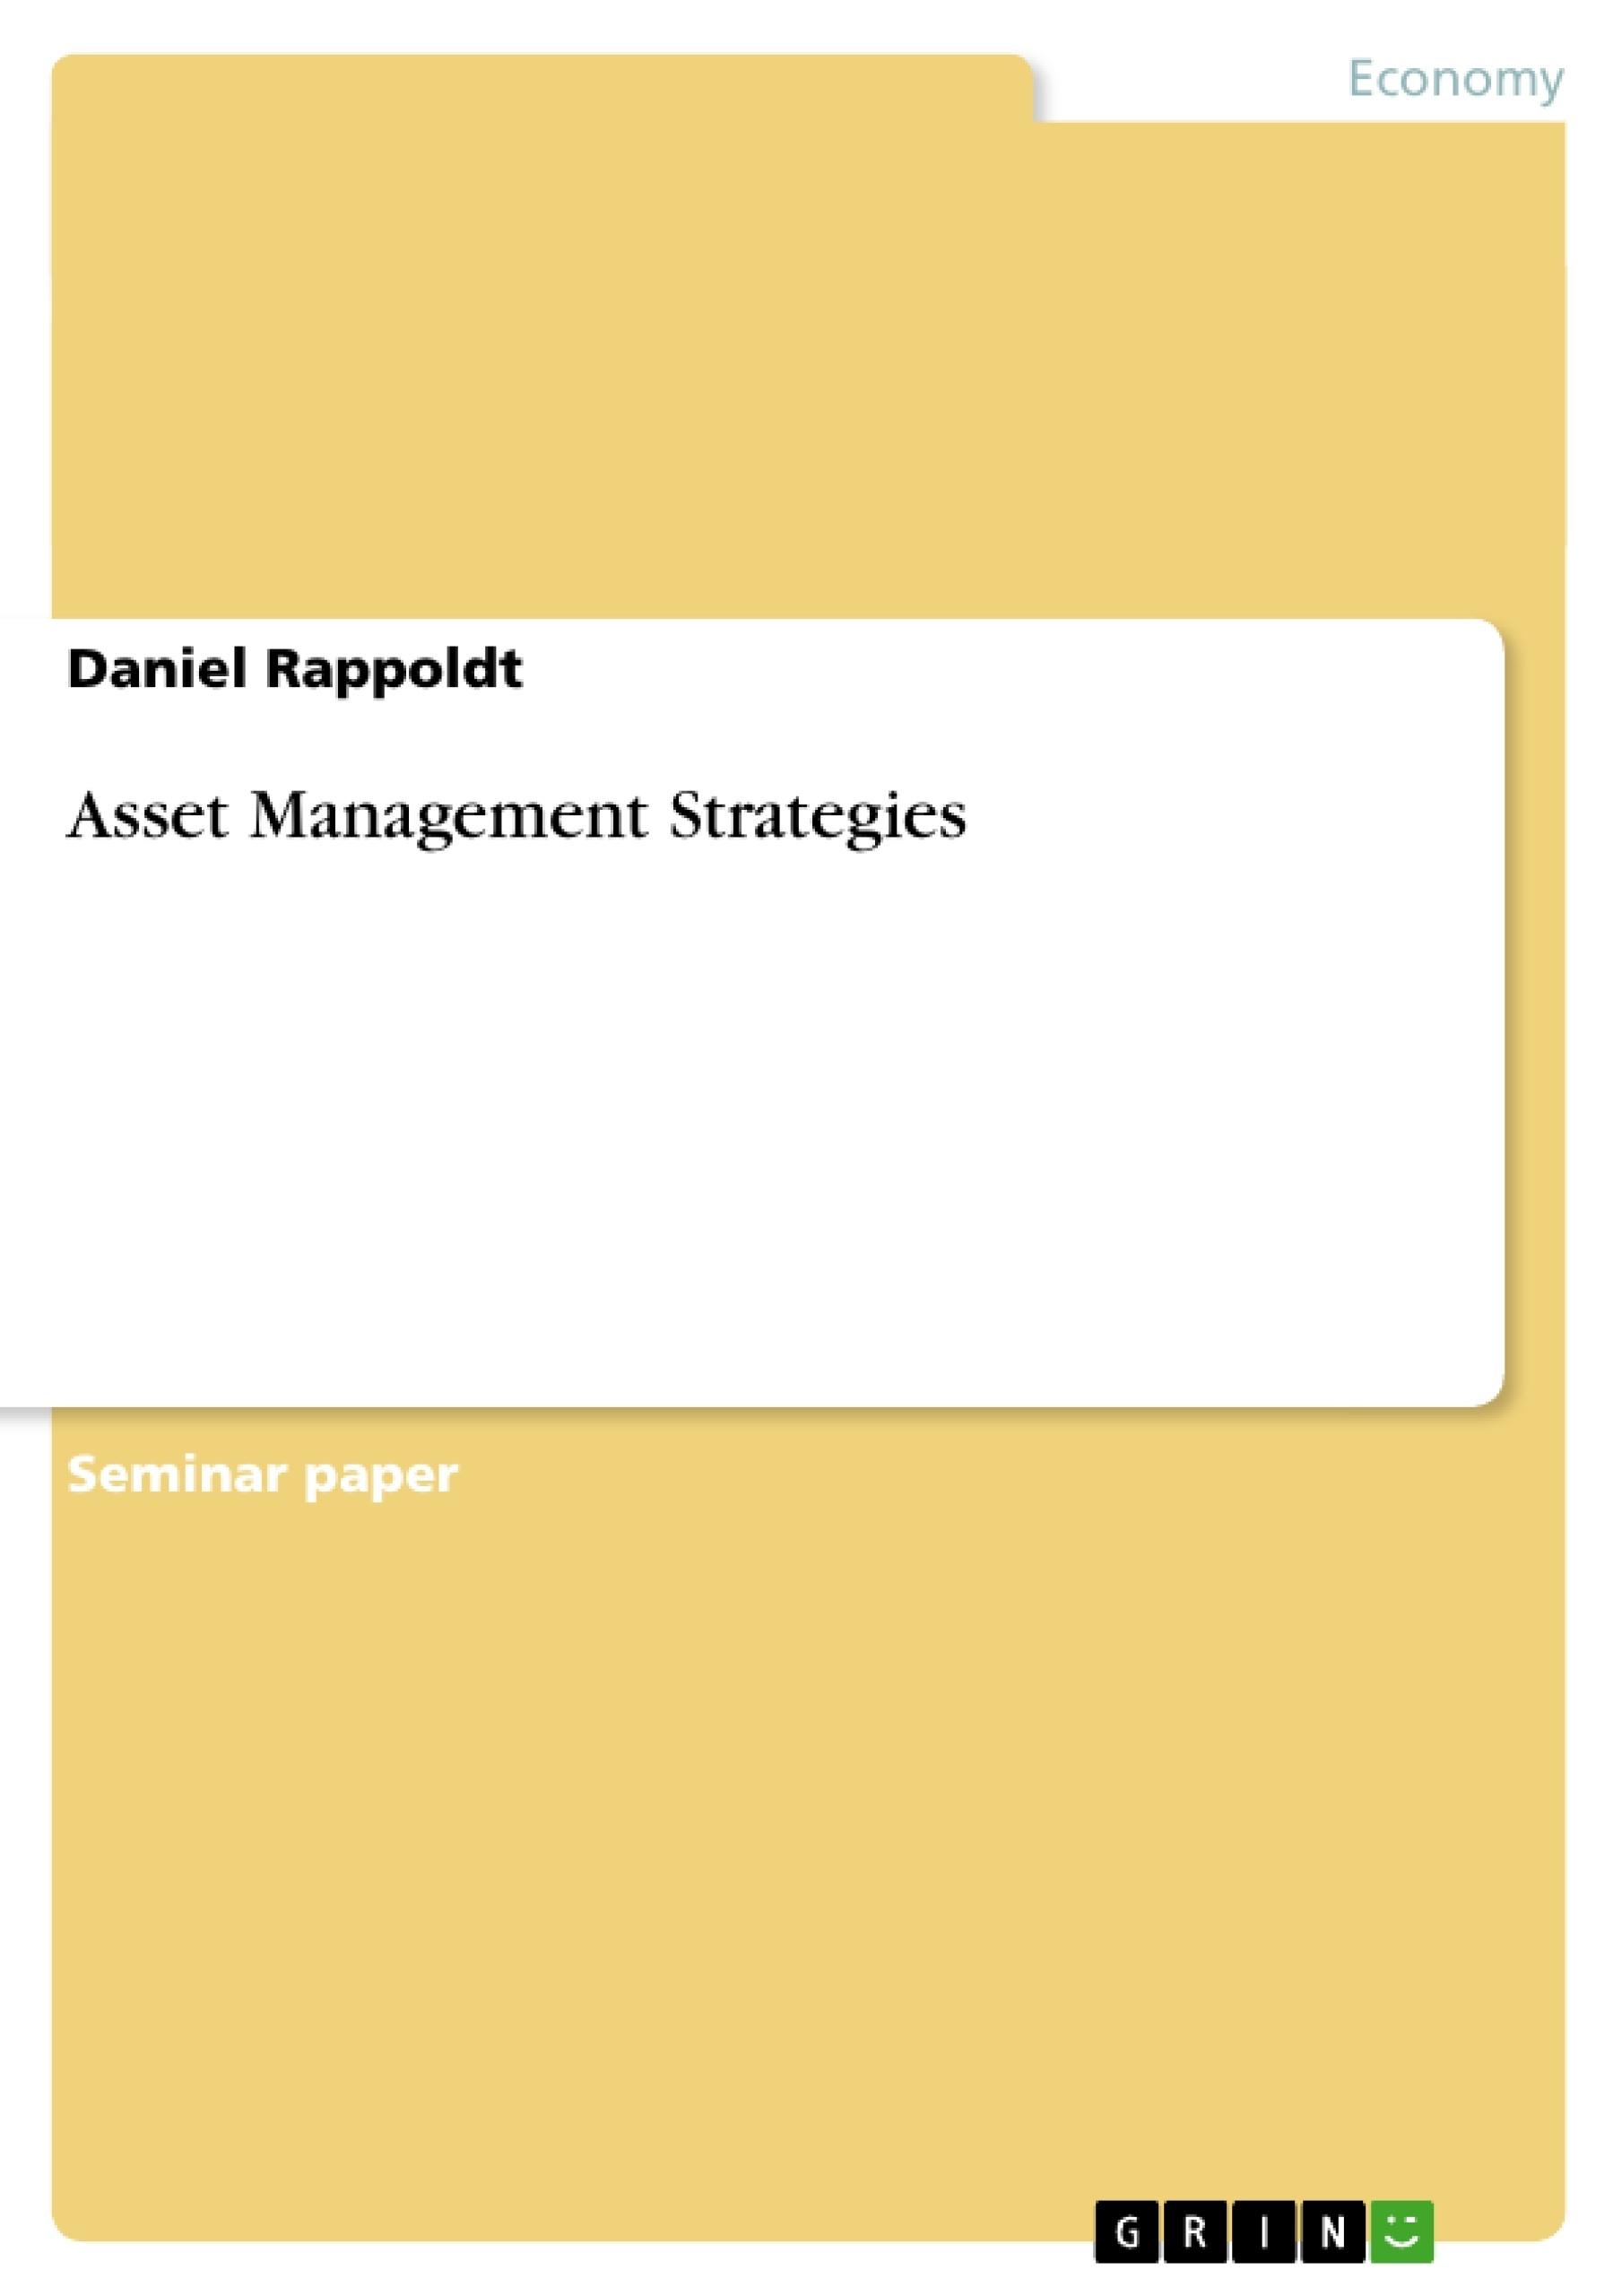 Title: Asset Management Strategies